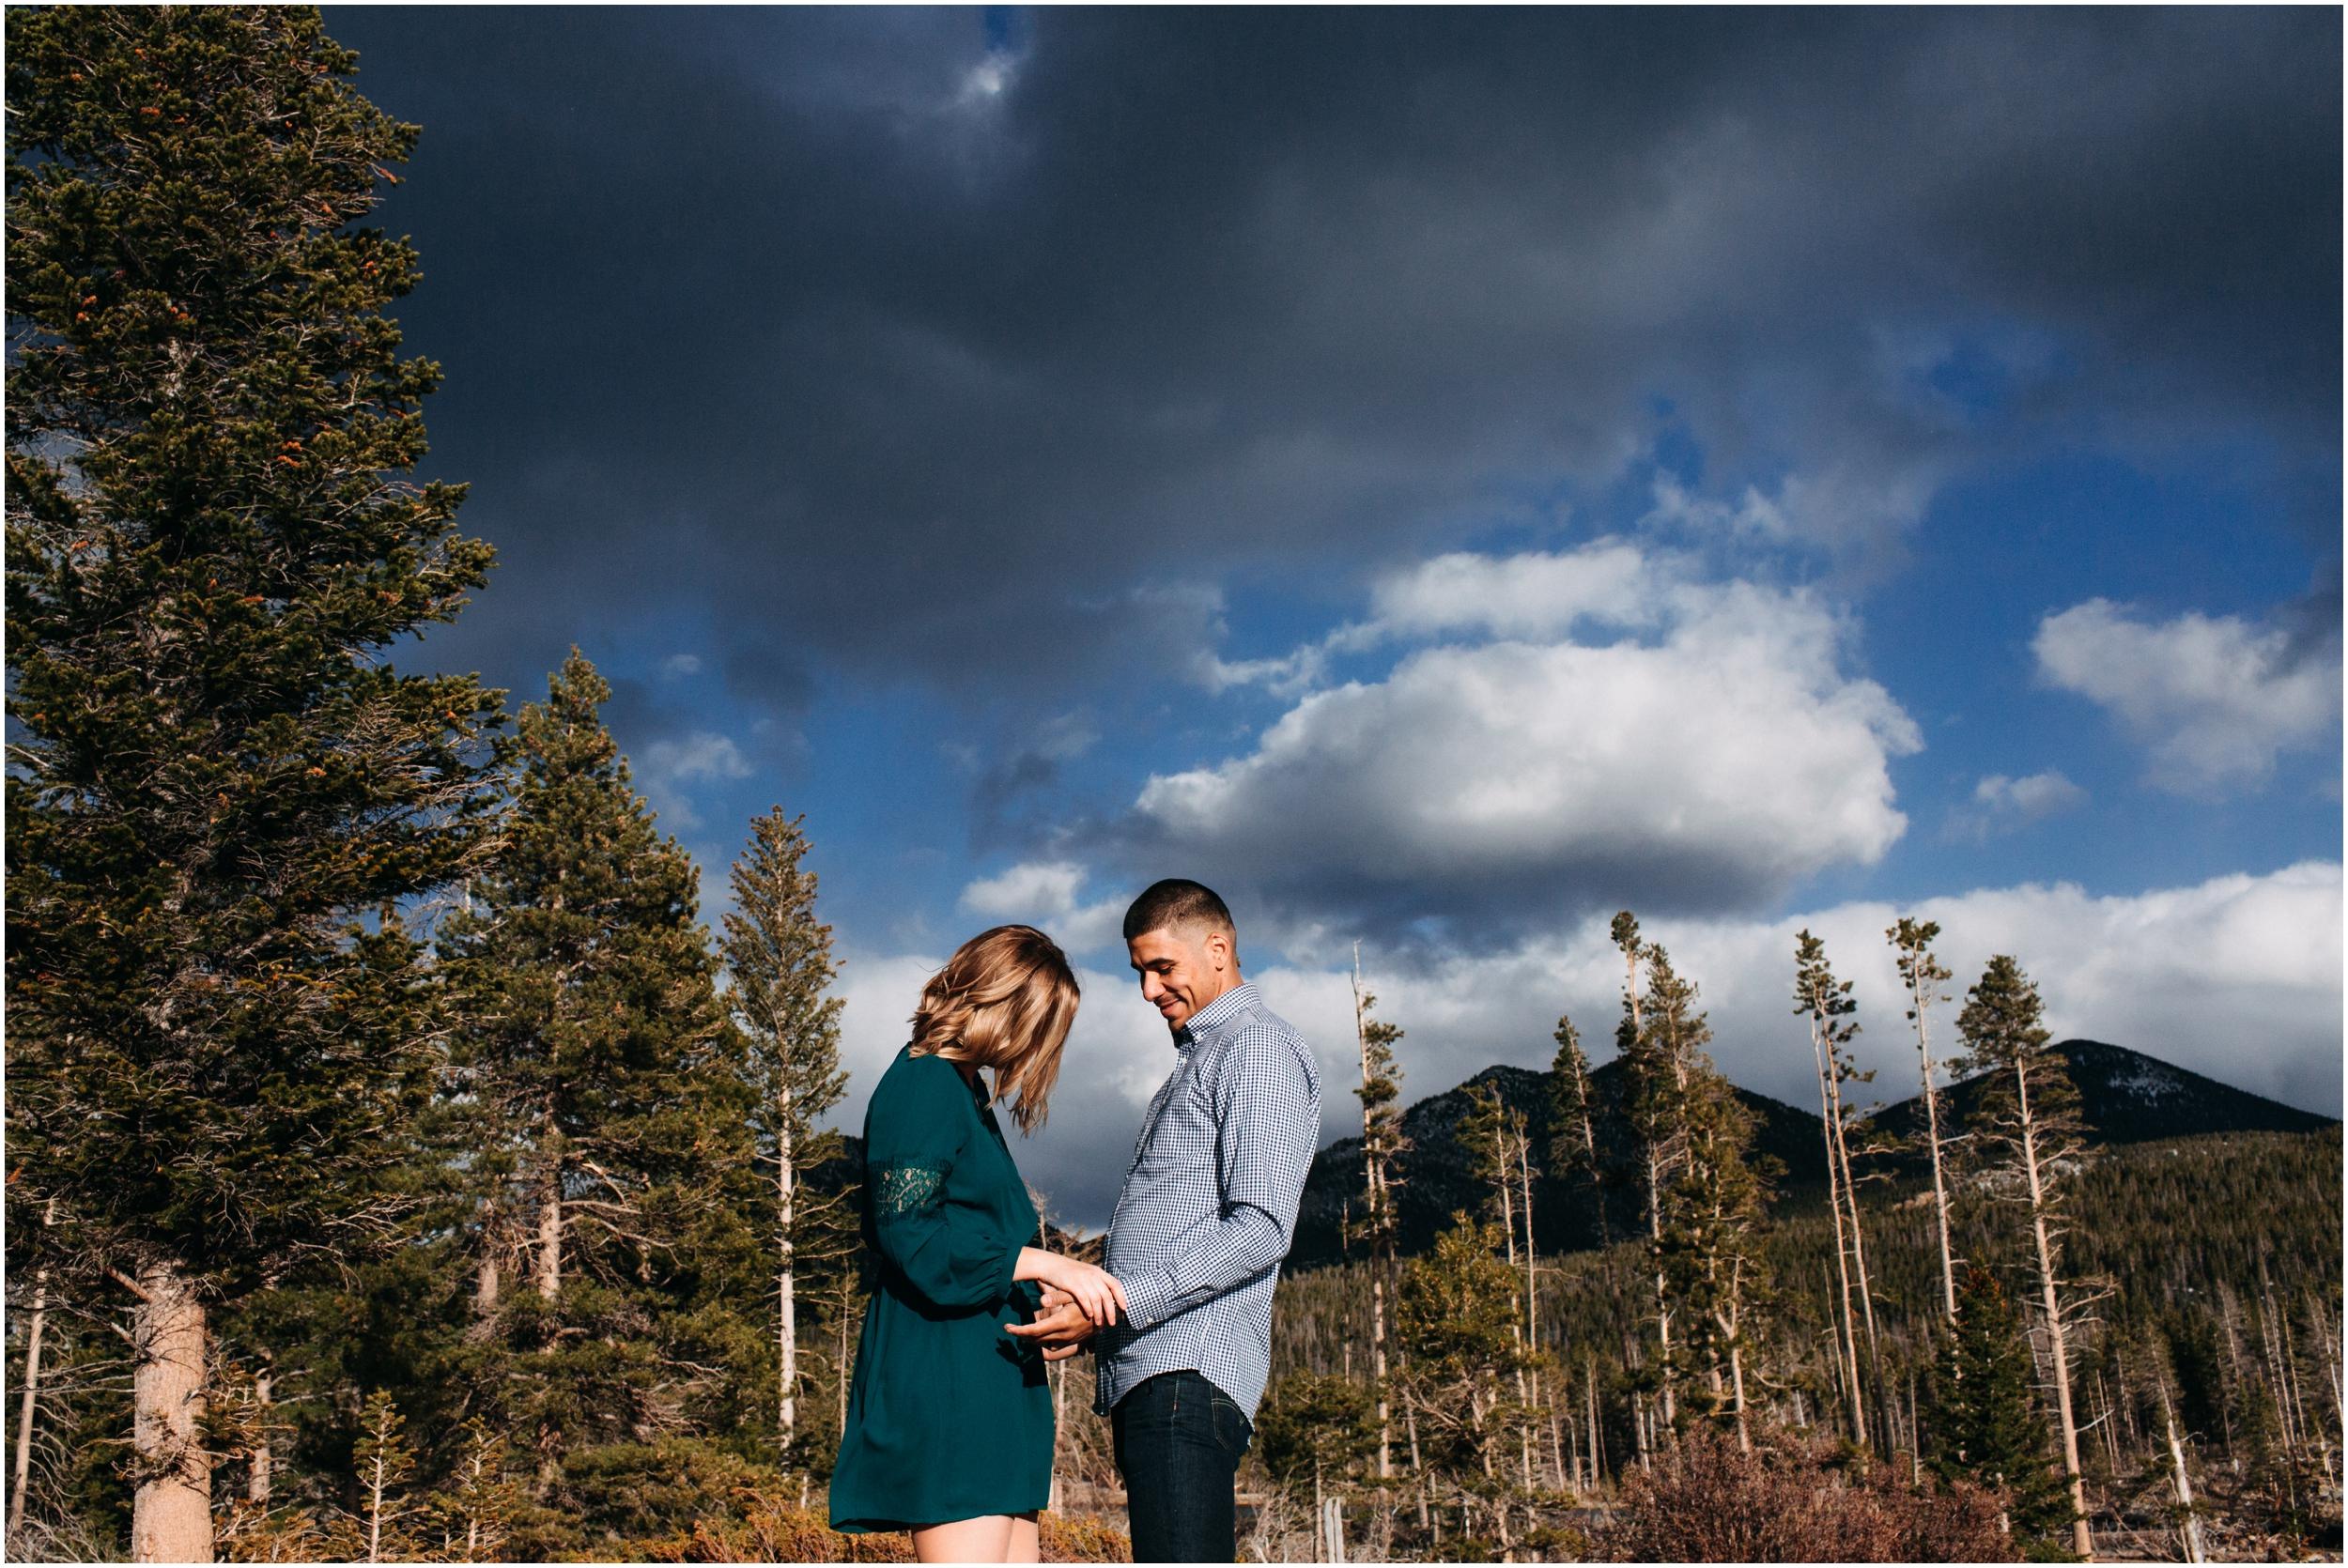 rocky-mountain-national-park-elopement-sprague-lake-colorado-adventure-wedding-photographer_taylor-powers_36.jpg